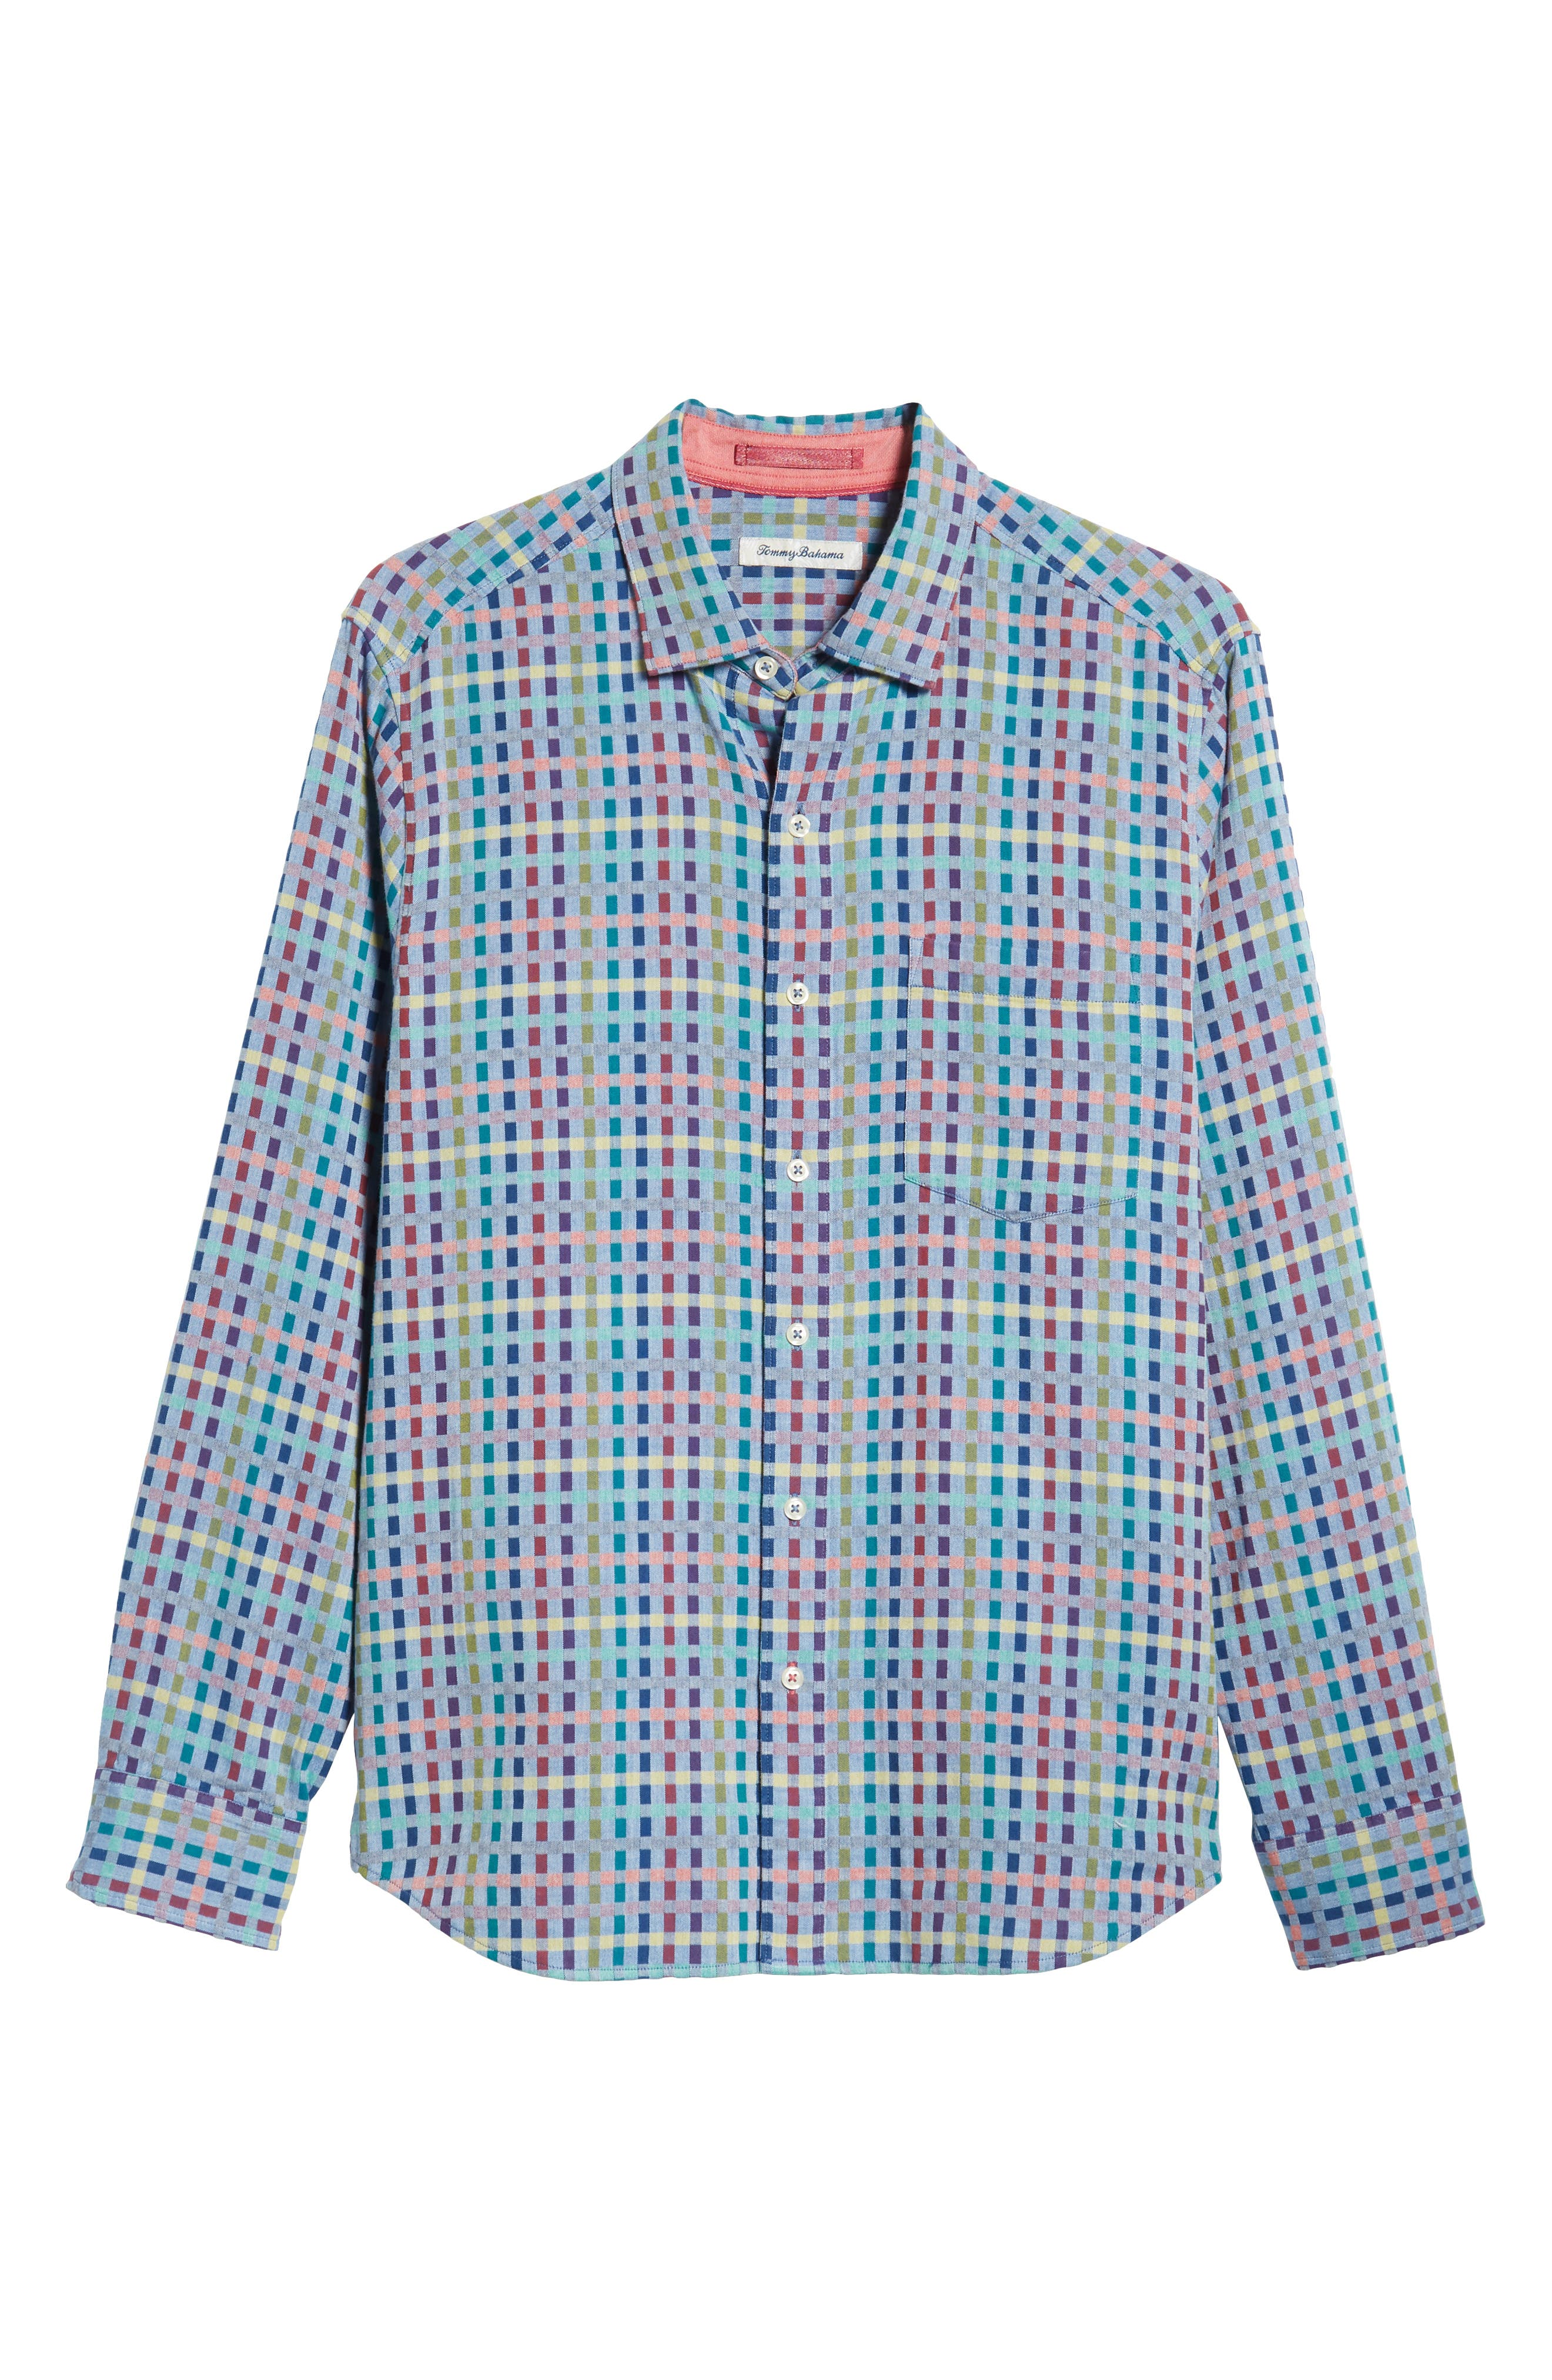 Prism Break Sport Shirt,                             Alternate thumbnail 5, color,                             DARK COBALT